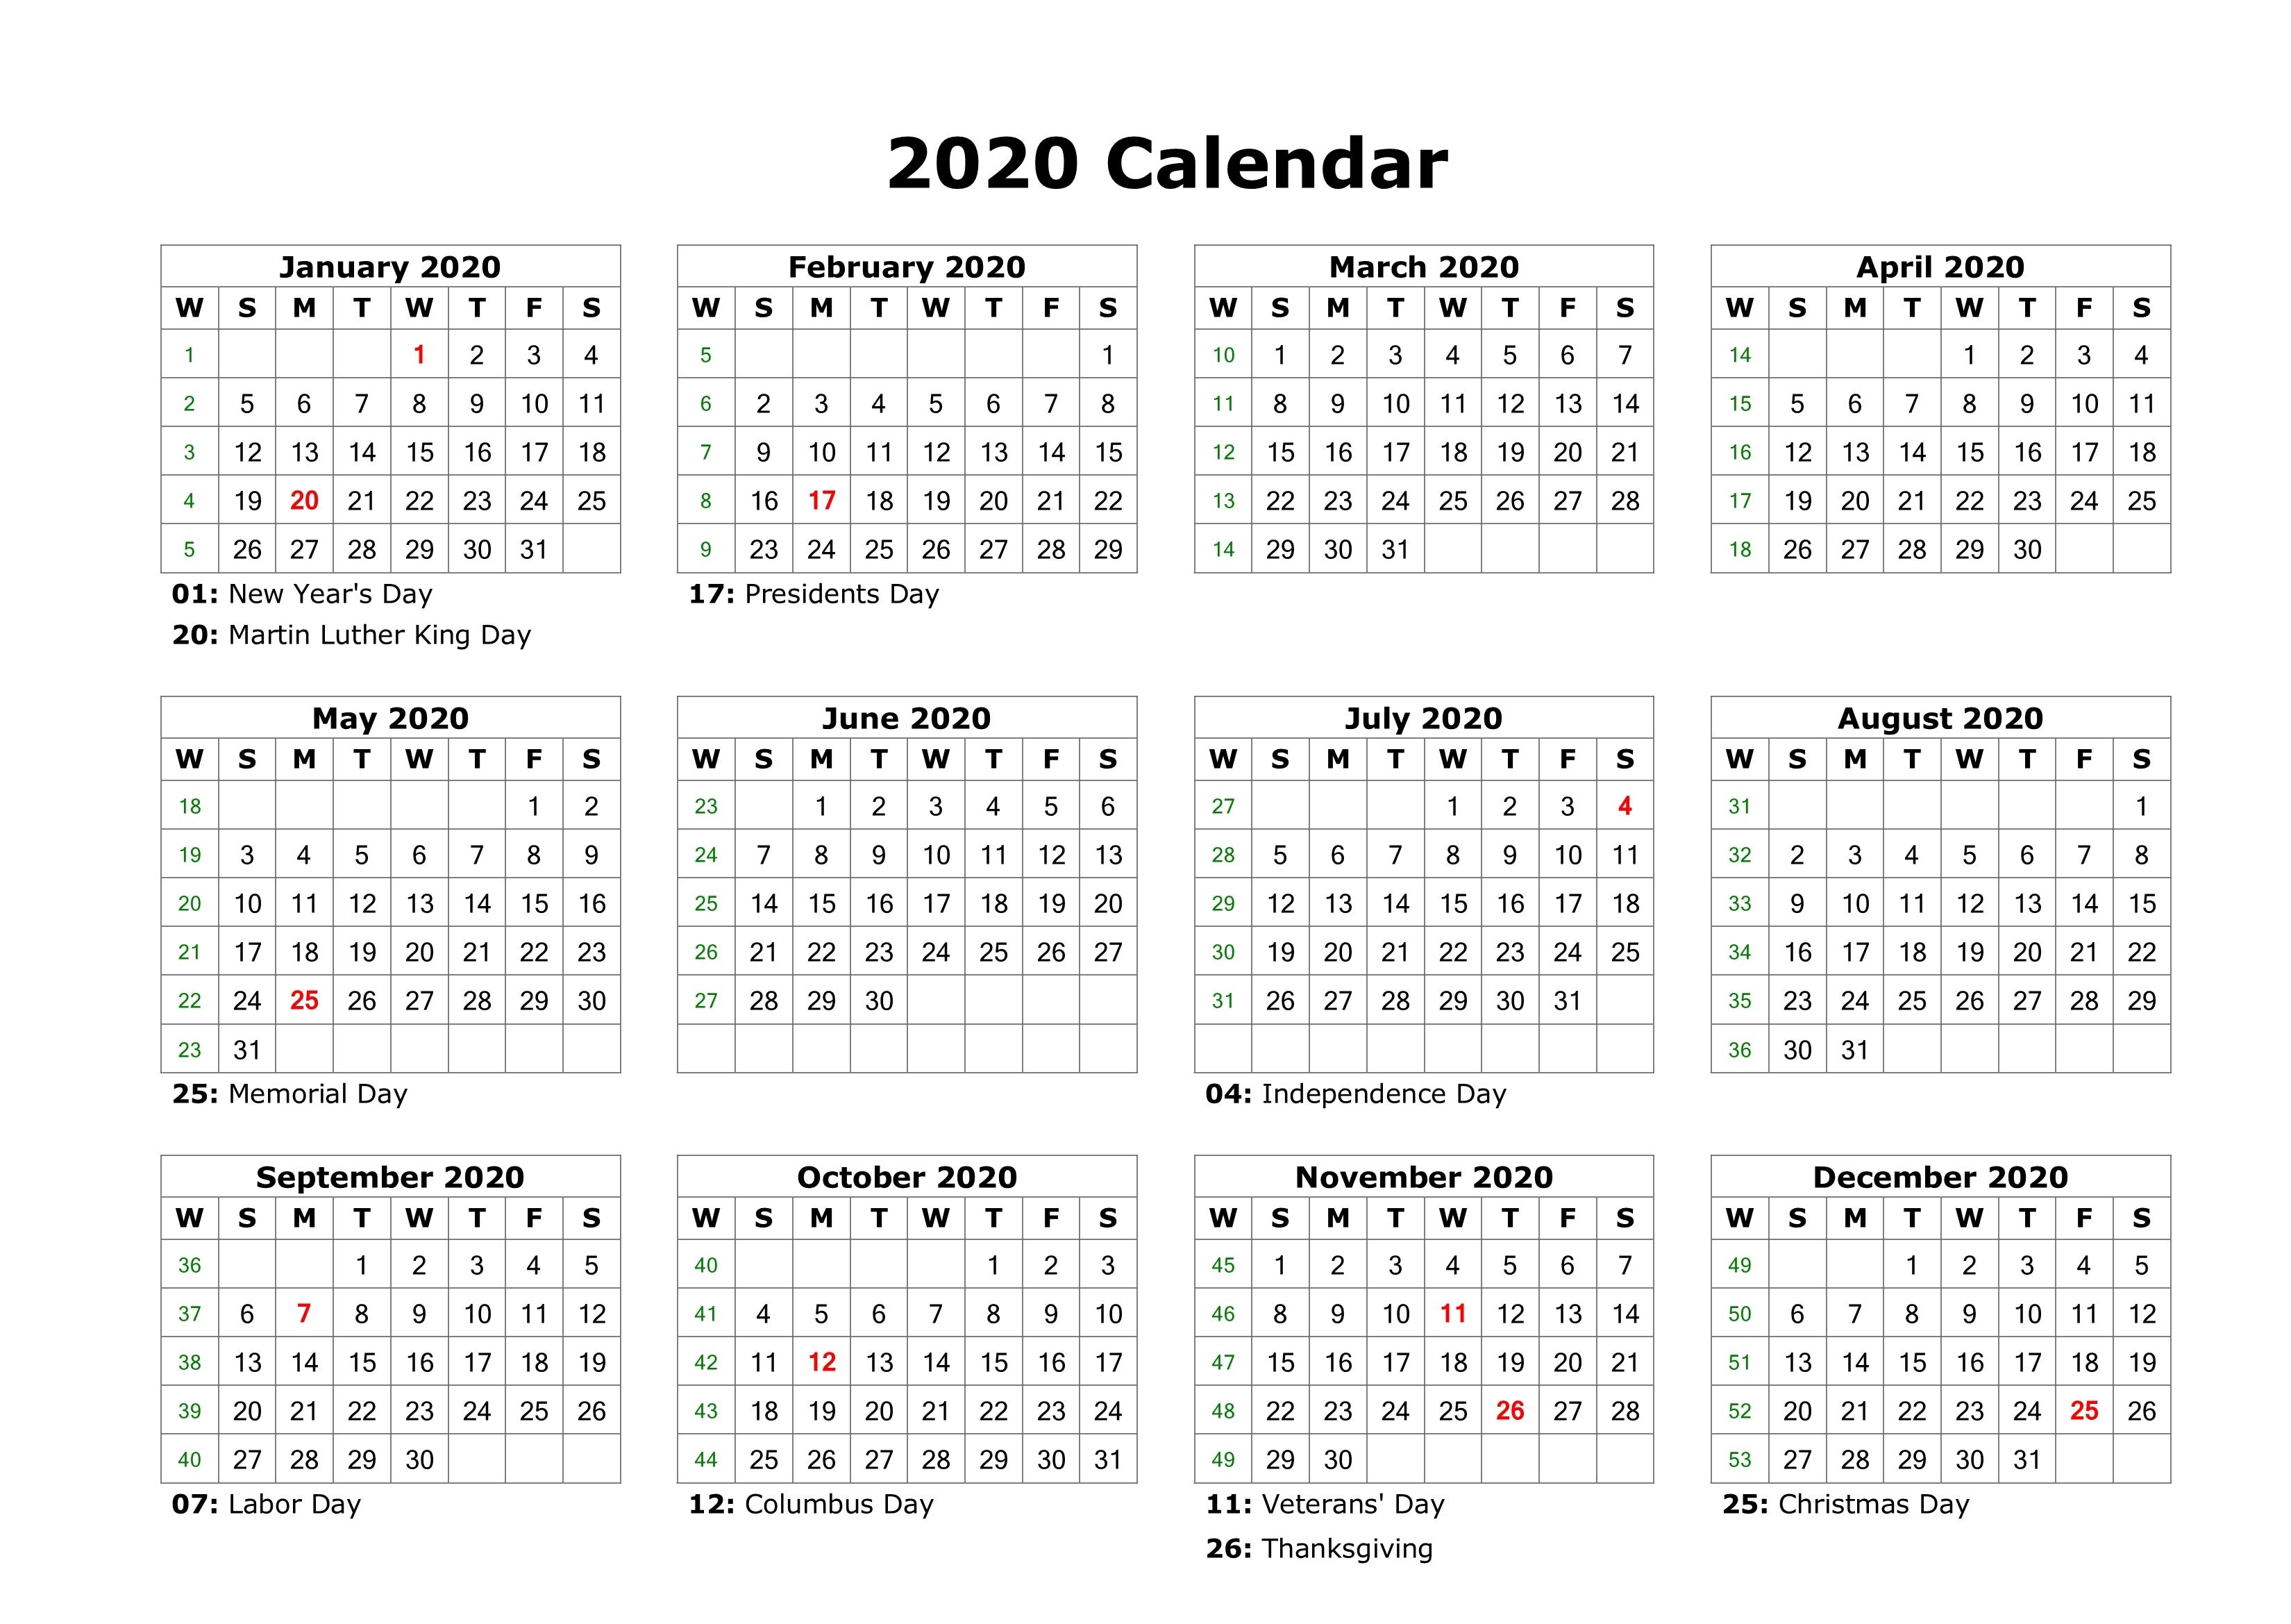 Editable 2020 Calendar Printable Template Blank With Notes